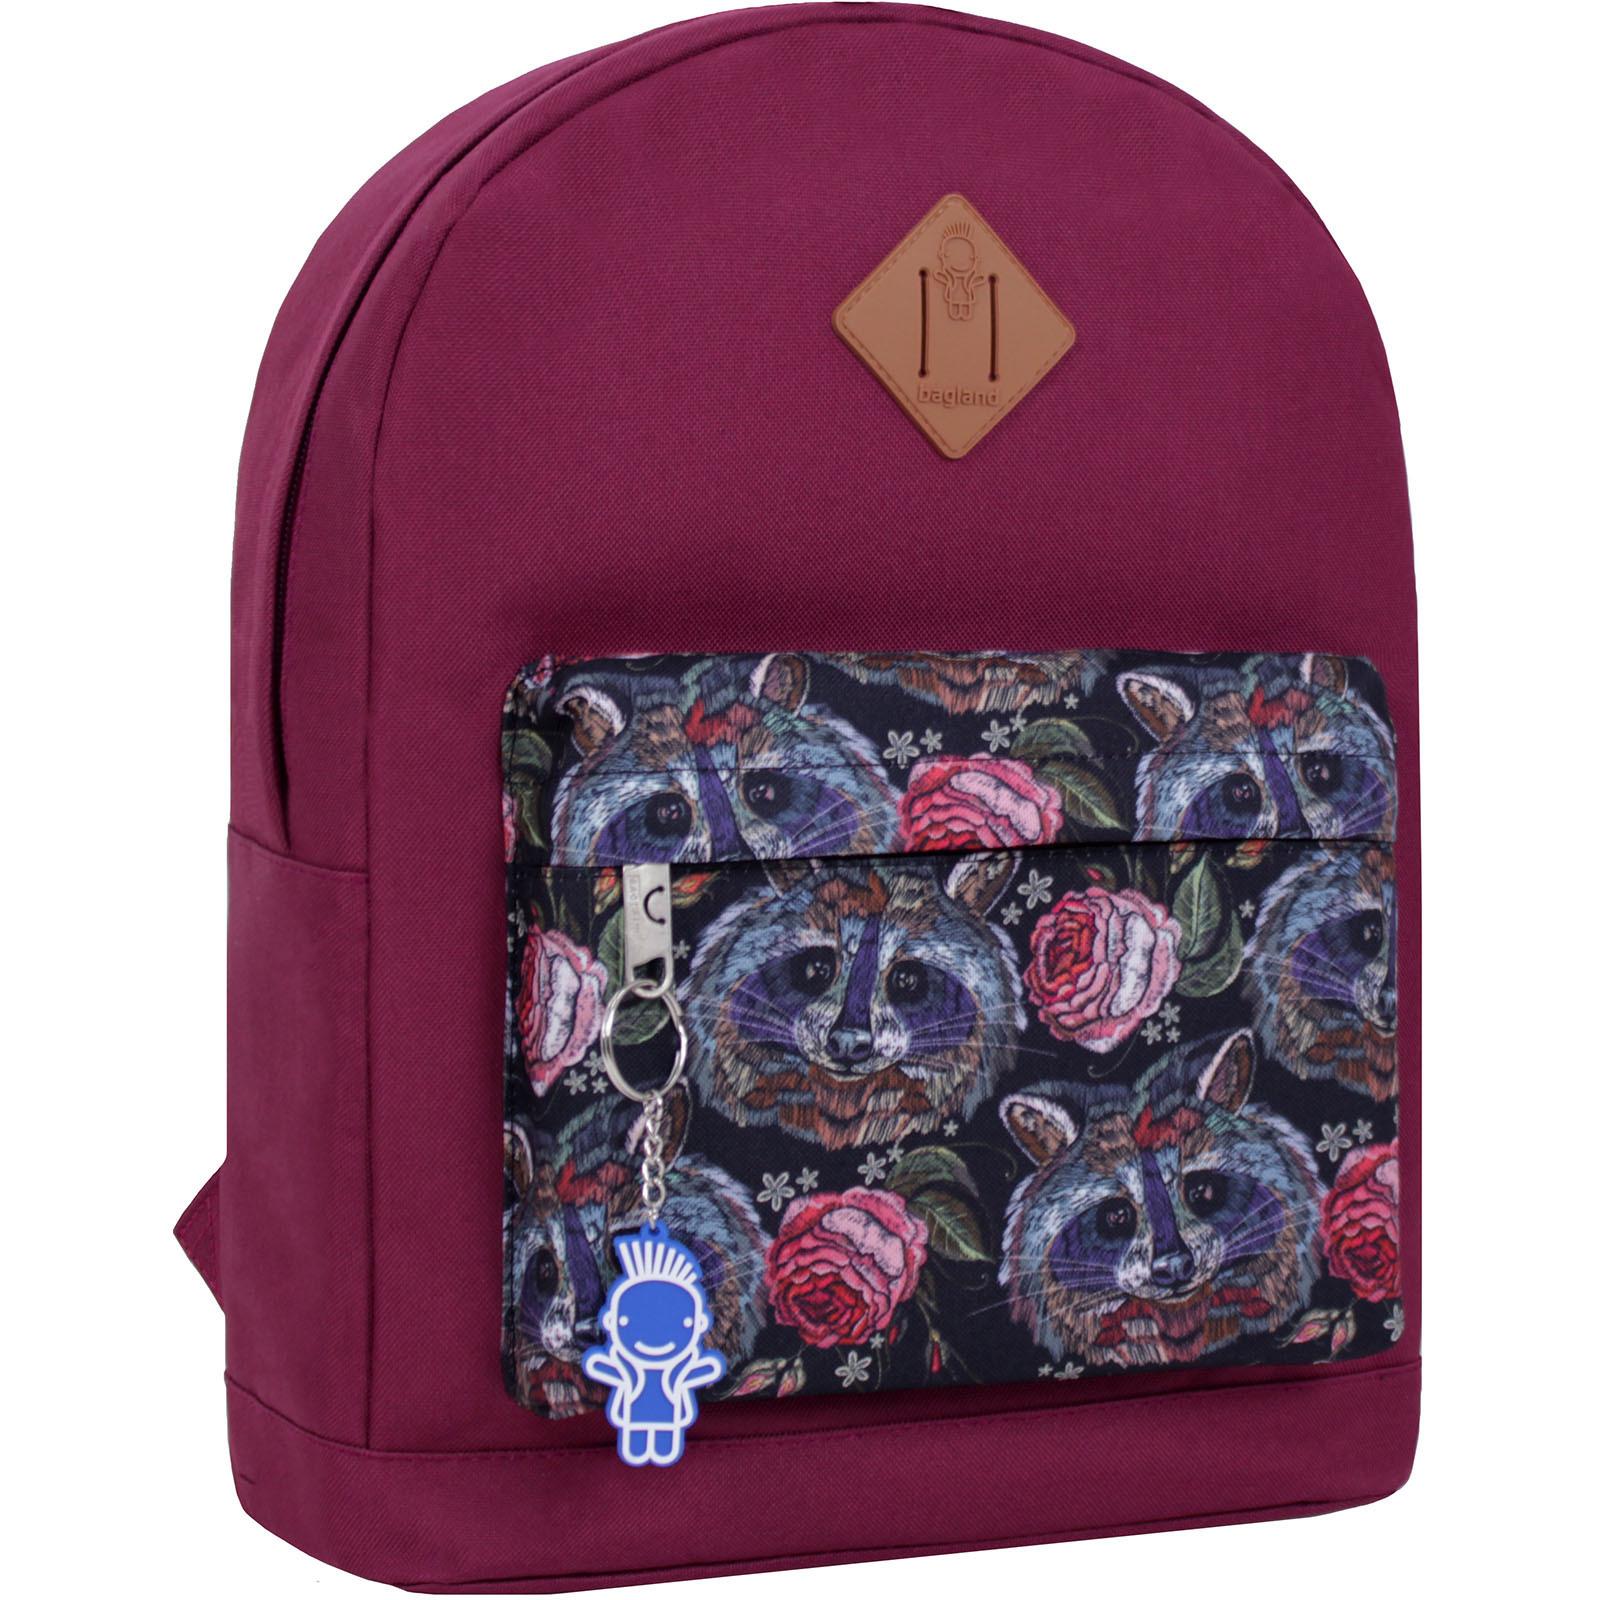 Городские рюкзаки Рюкзак Bagland Молодежный W/R 17 л. вишня 477 (00533662) IMG_2675_суб.477_.JPG